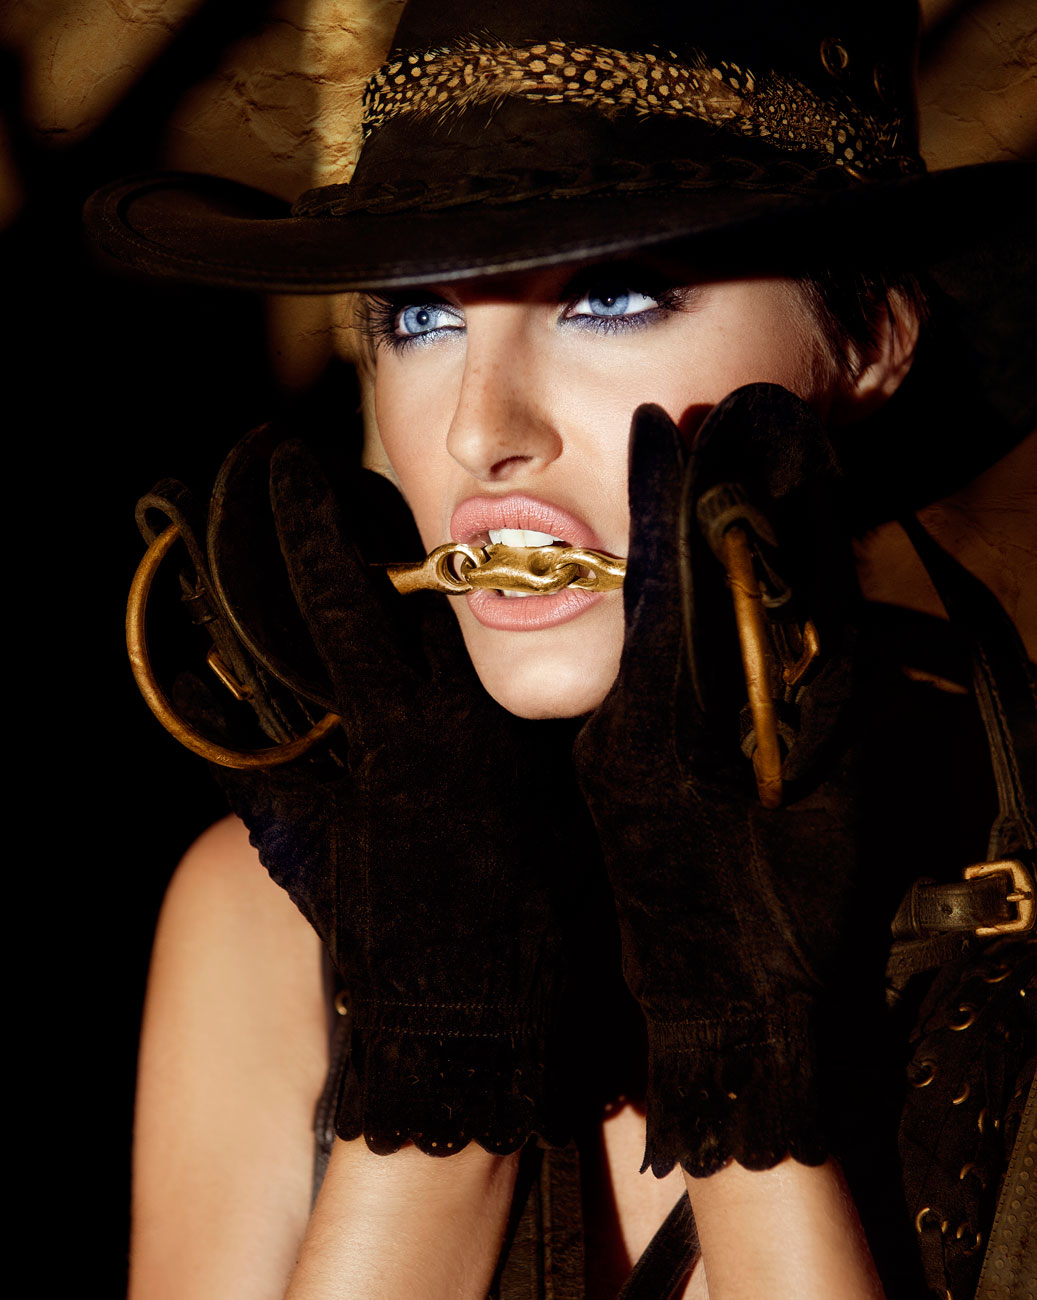 fantasy-music-daniella-midenge-photographer-filip-cederholm-yaya-creative-1.jpg